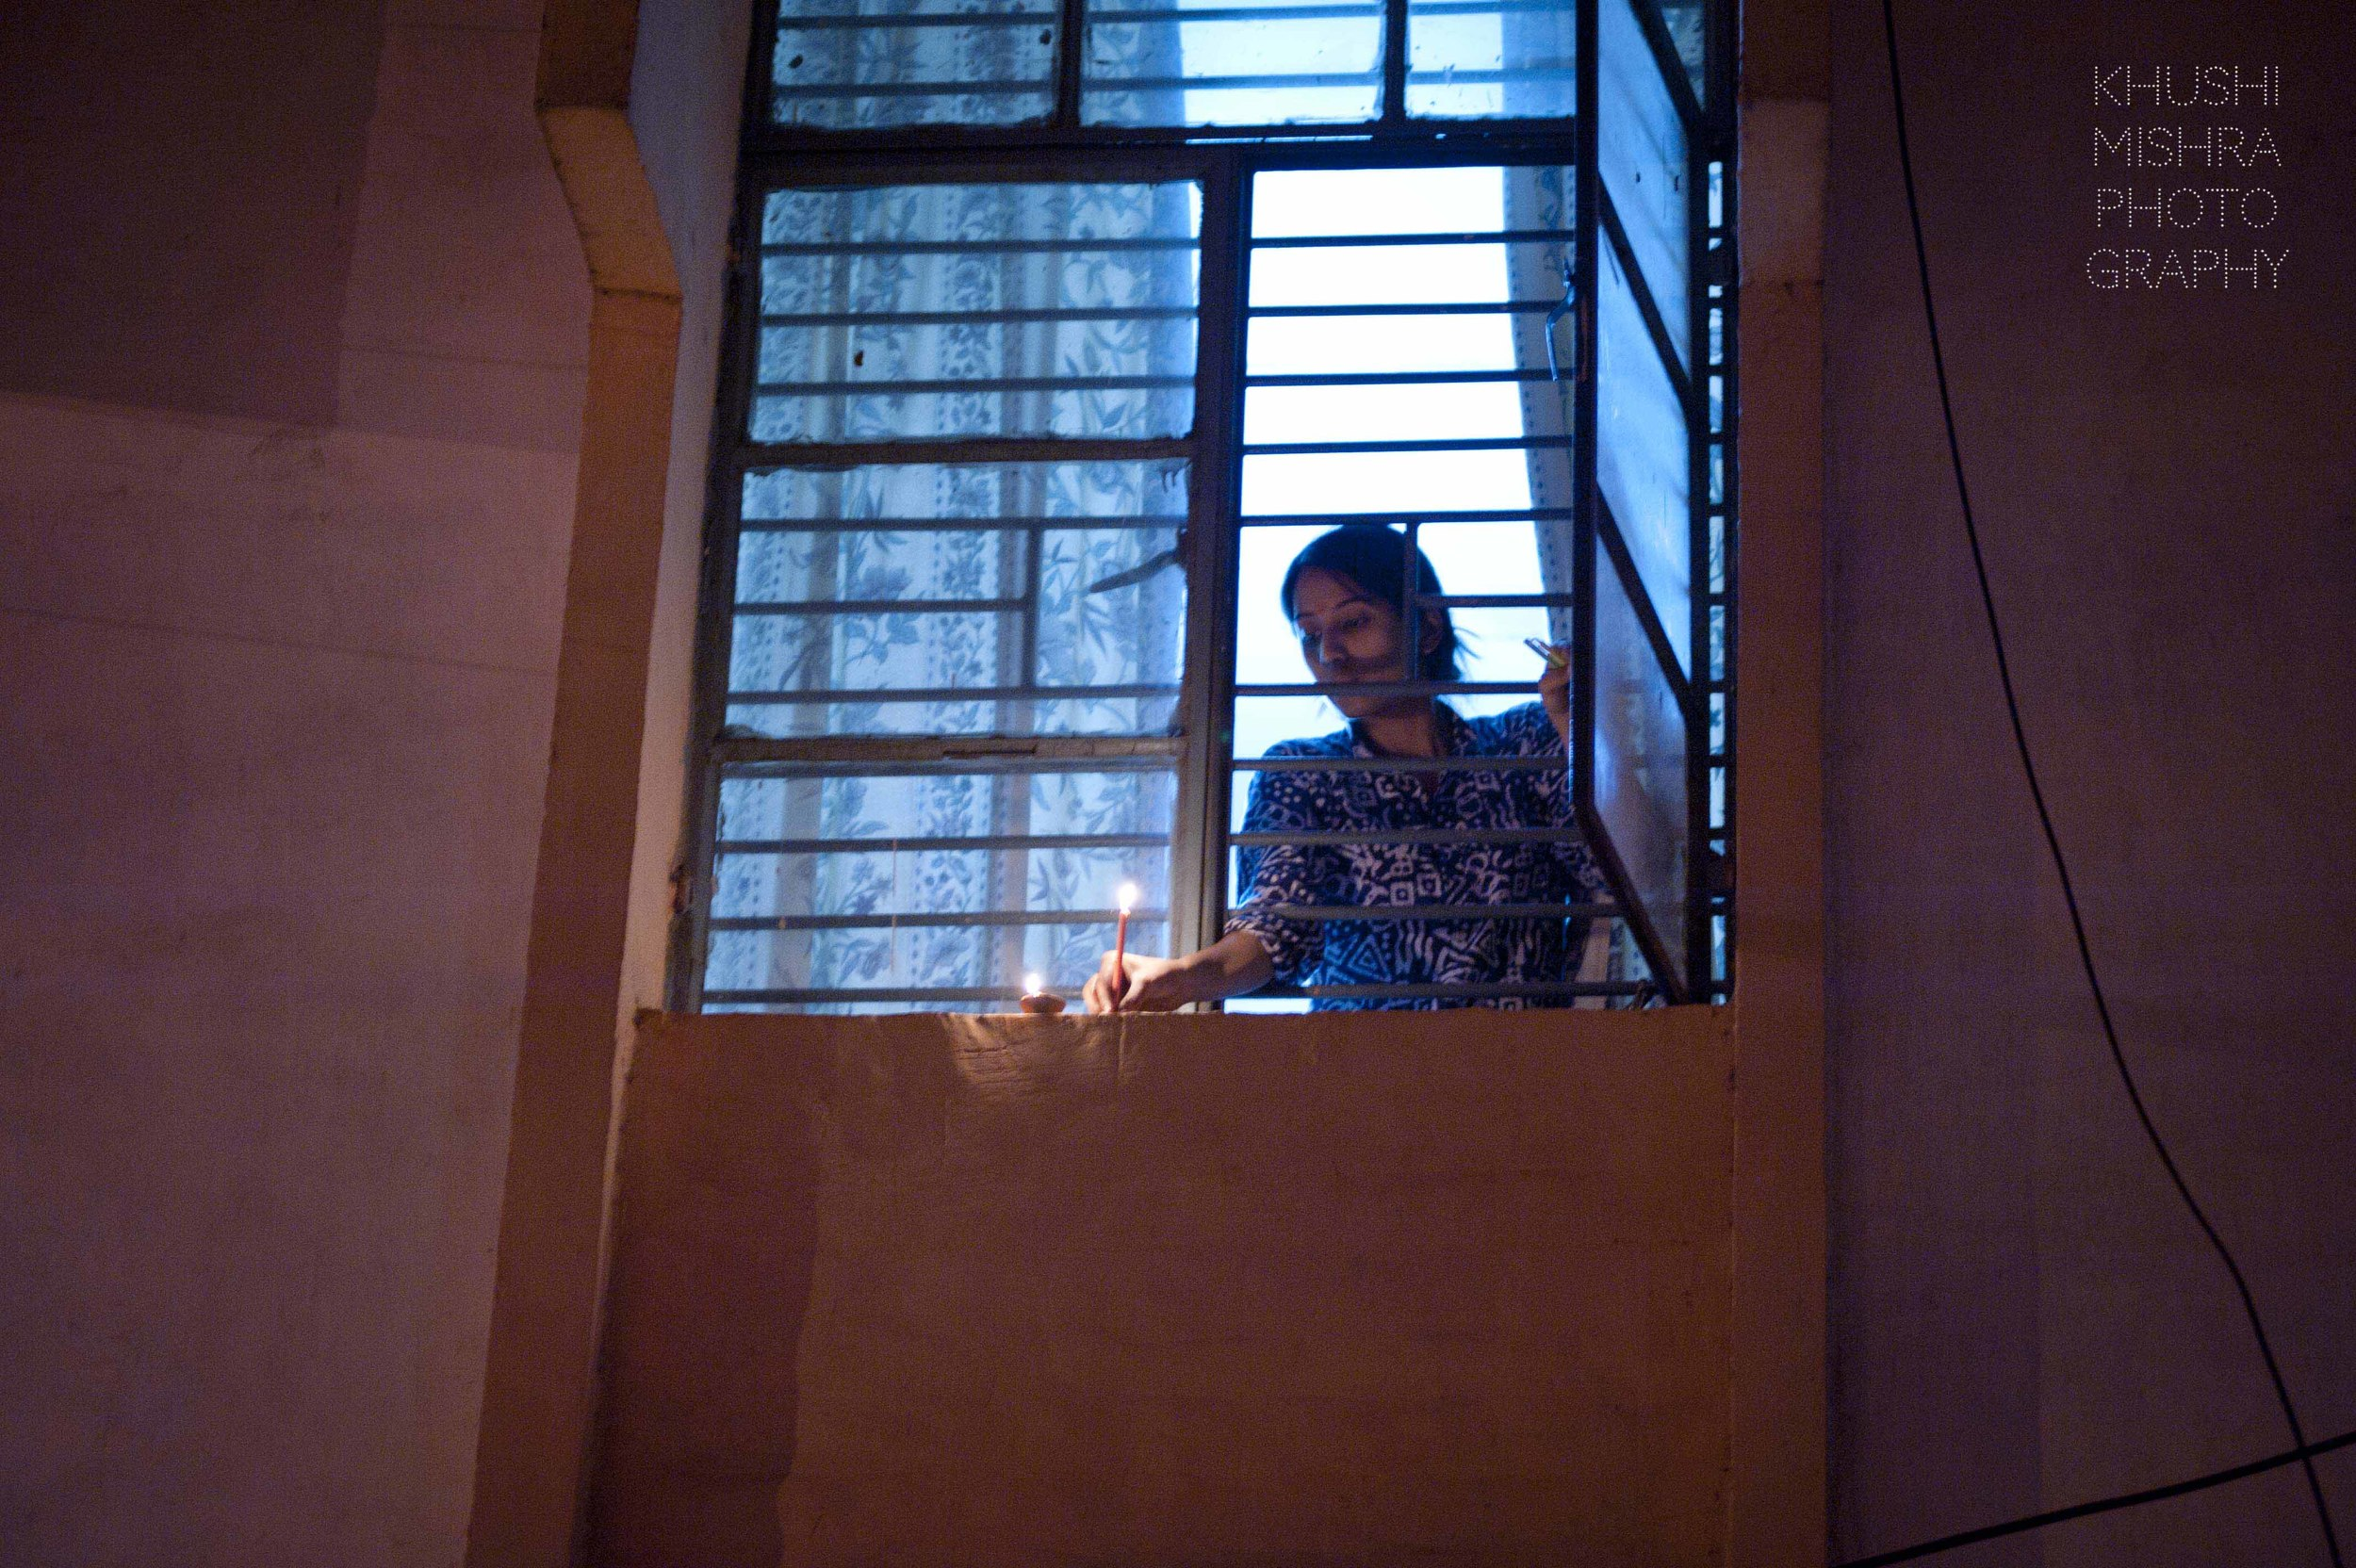 neighbour diwali_diwali_dsc_5335.jpg